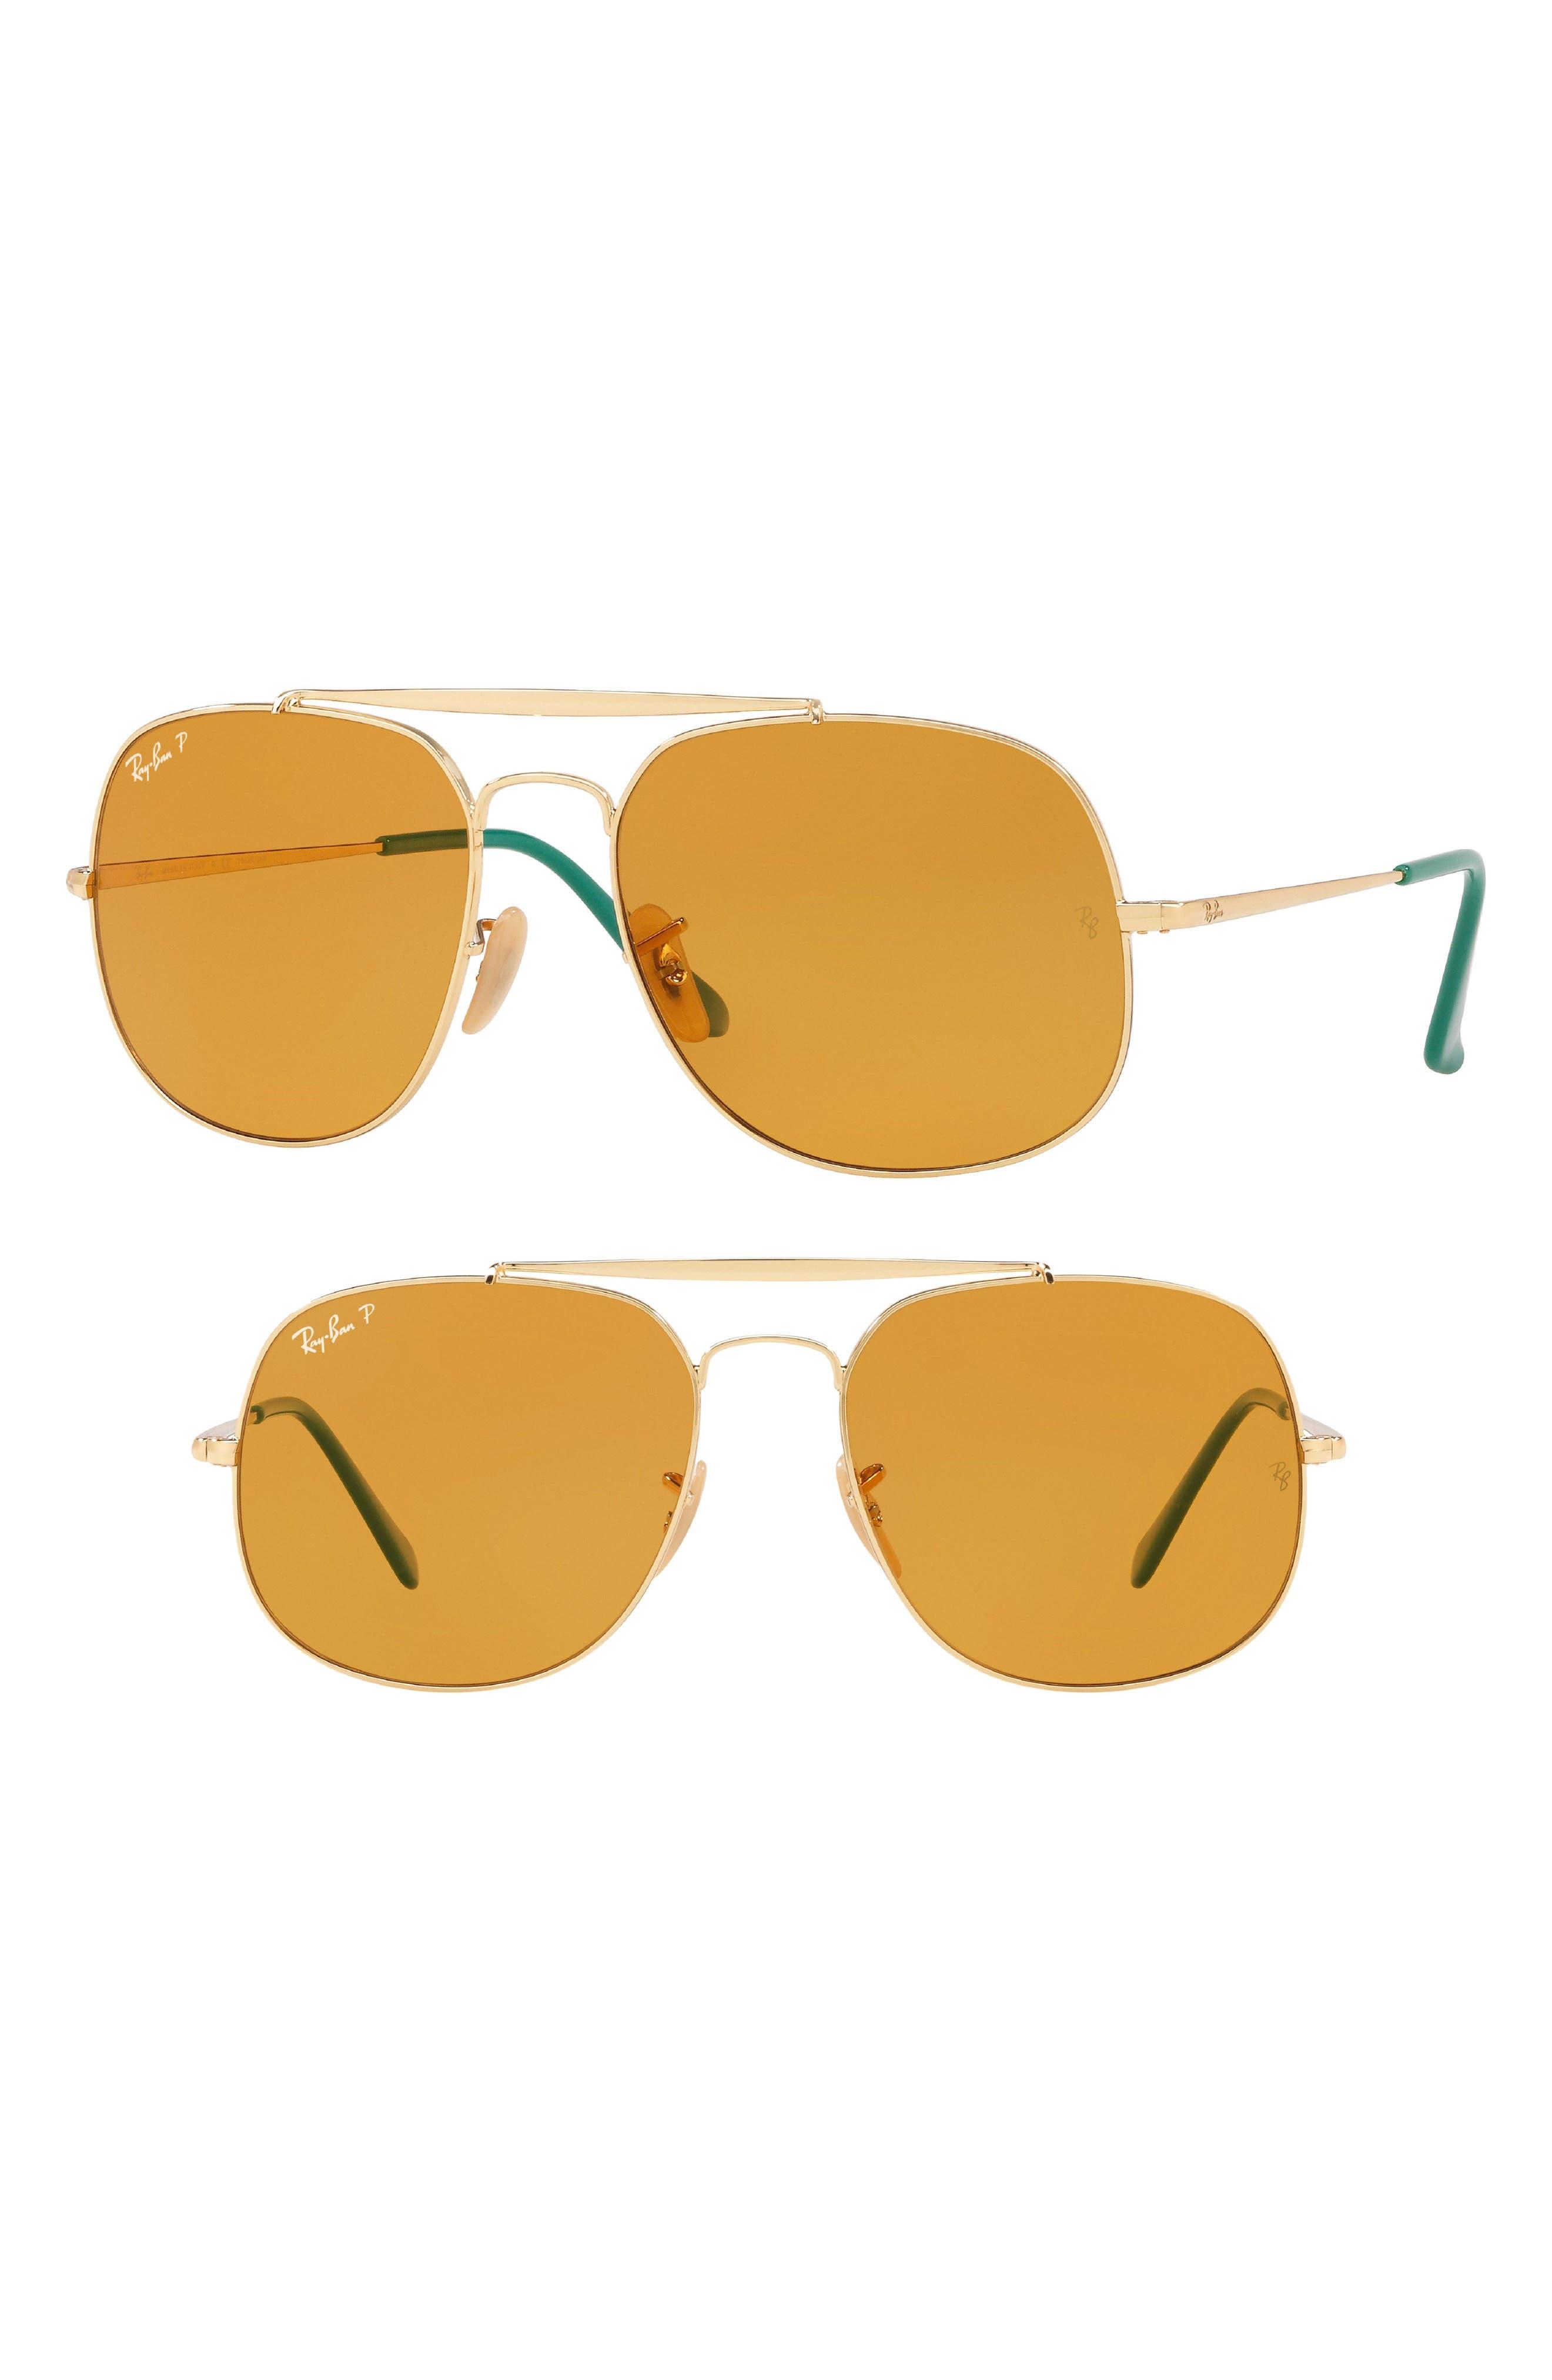 57mm Polarized Aviator Sunglasses,                             Main thumbnail 1, color,                             Gold